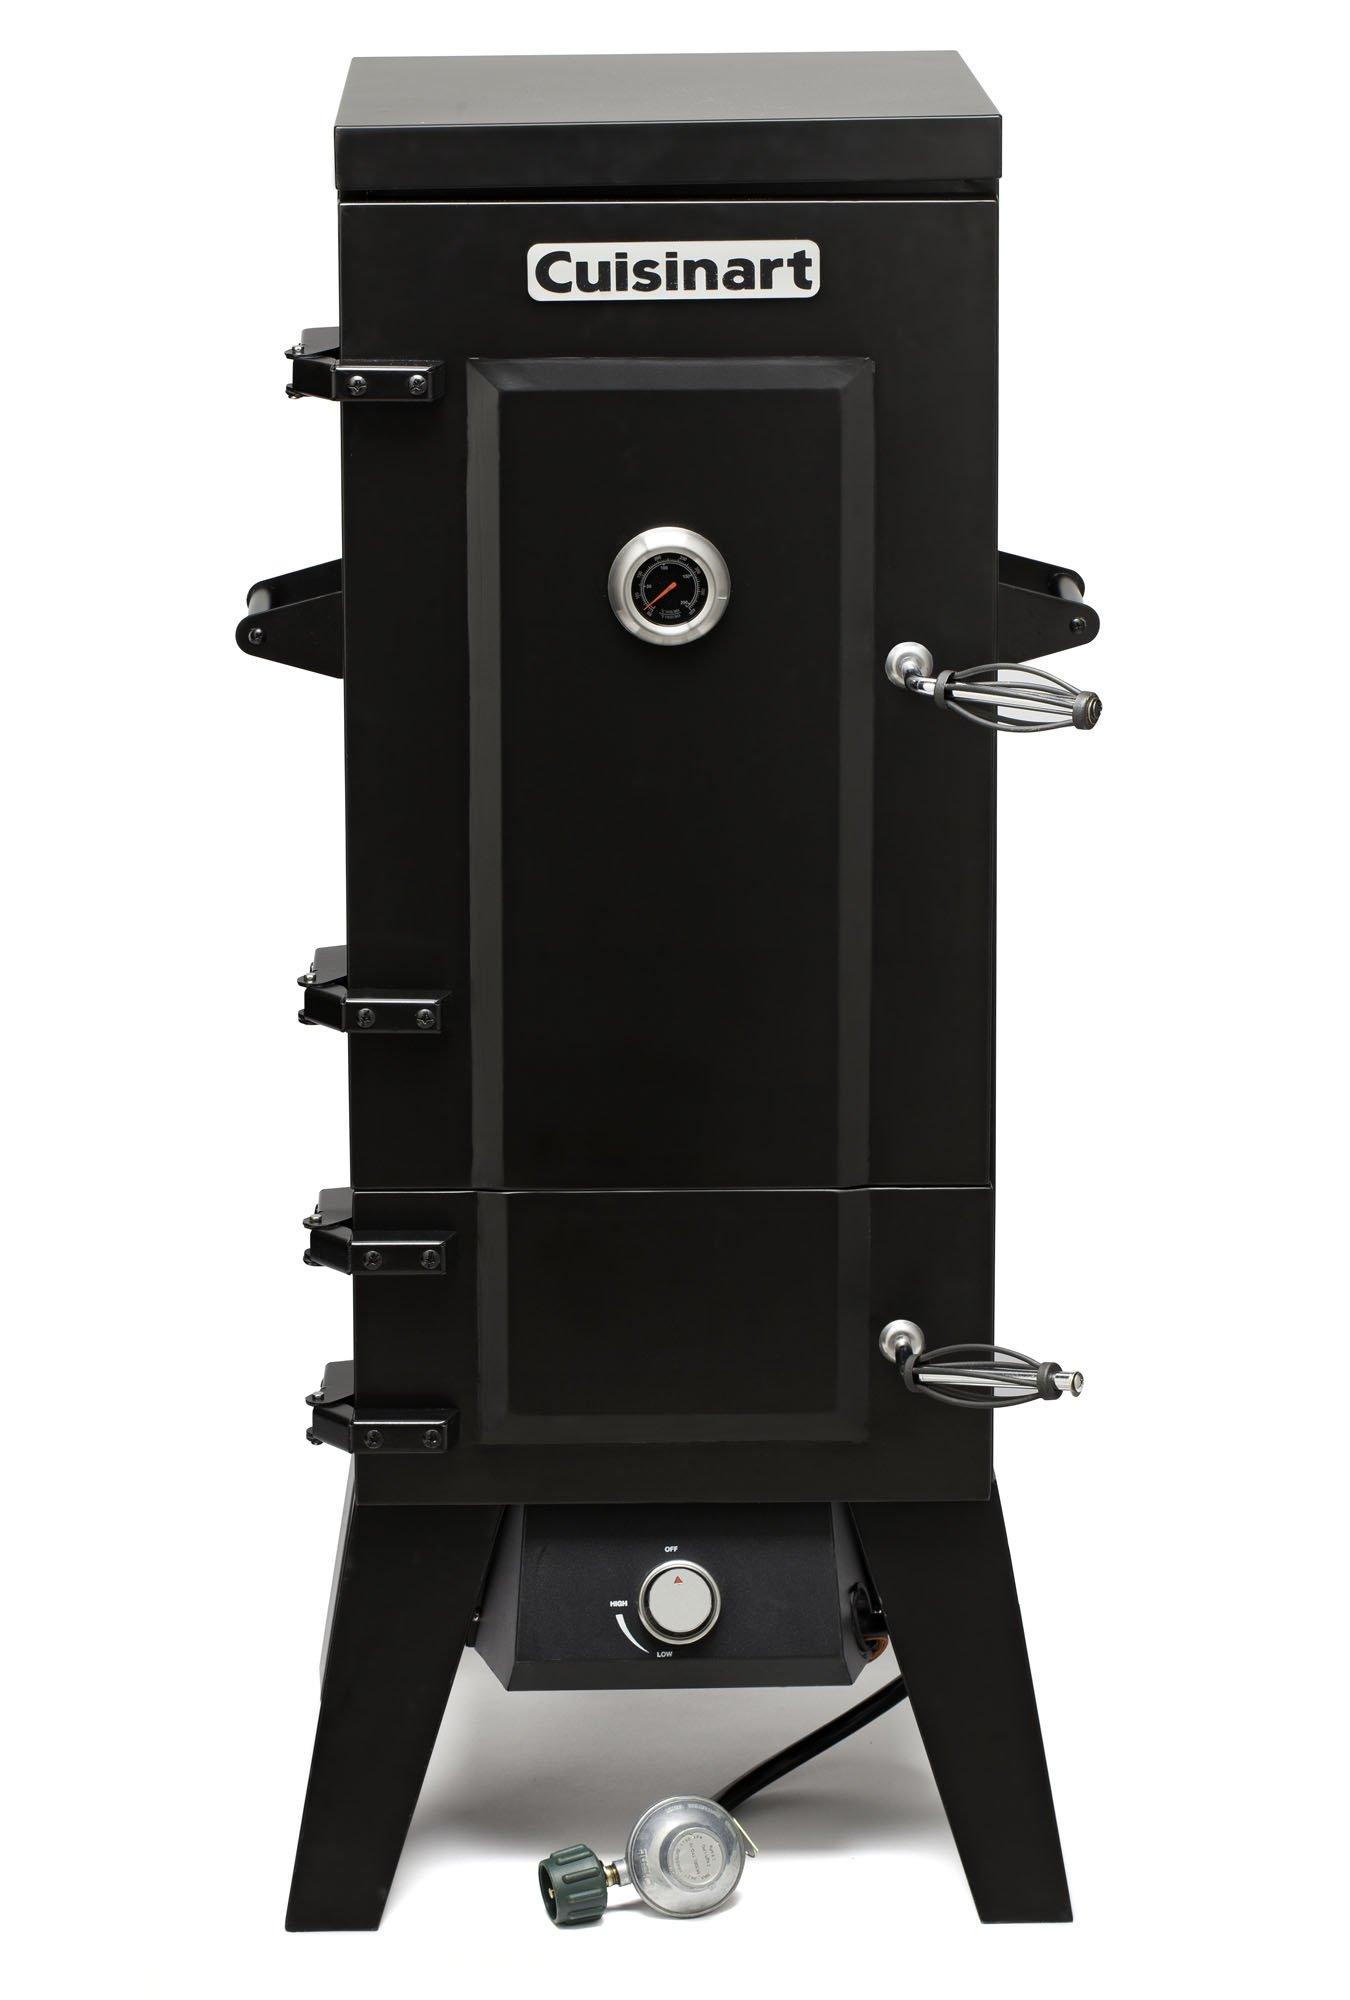 Cuisinart COS-244 Vertical 36'' Propane Smoker, Black